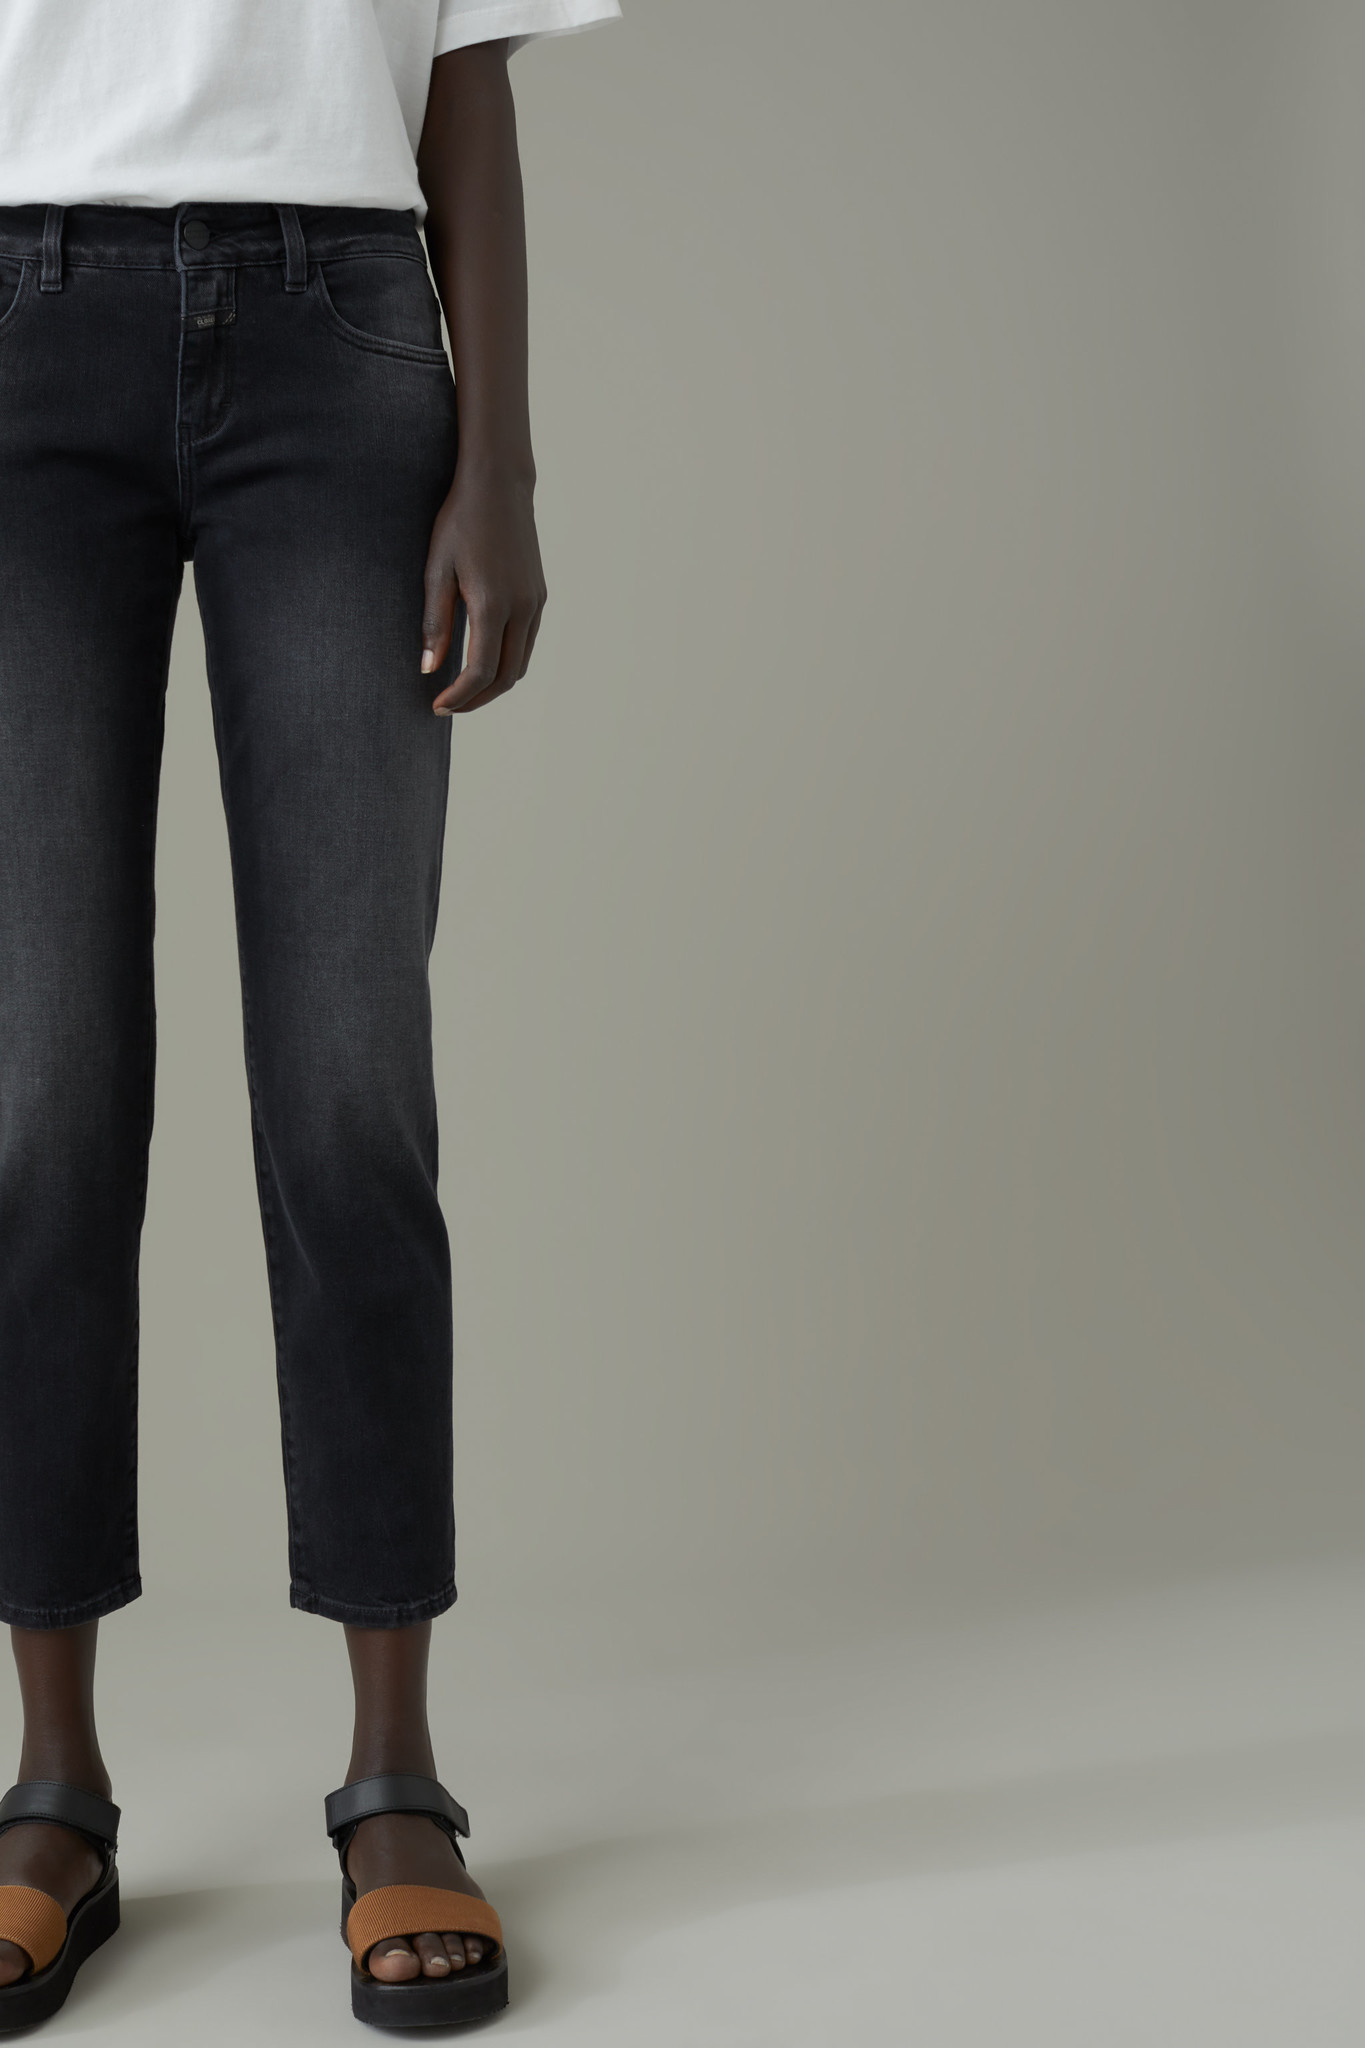 Closed Jeans C91833 03Z 3E-4